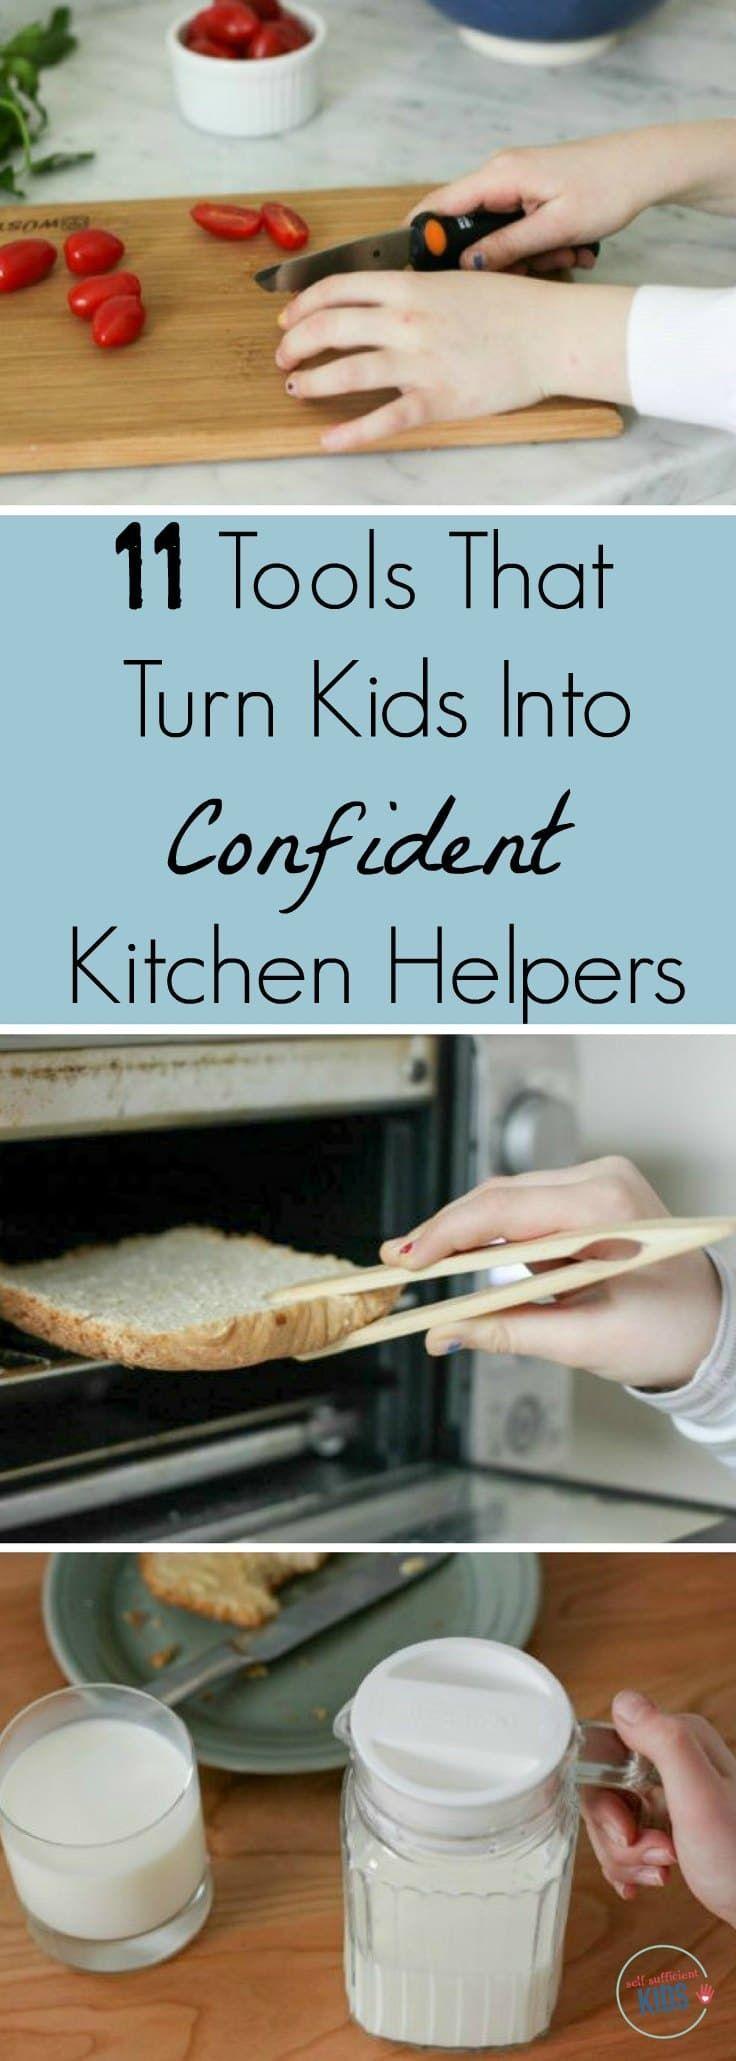 97 best Kids In The Kitchen images on Pinterest | Montessori ...